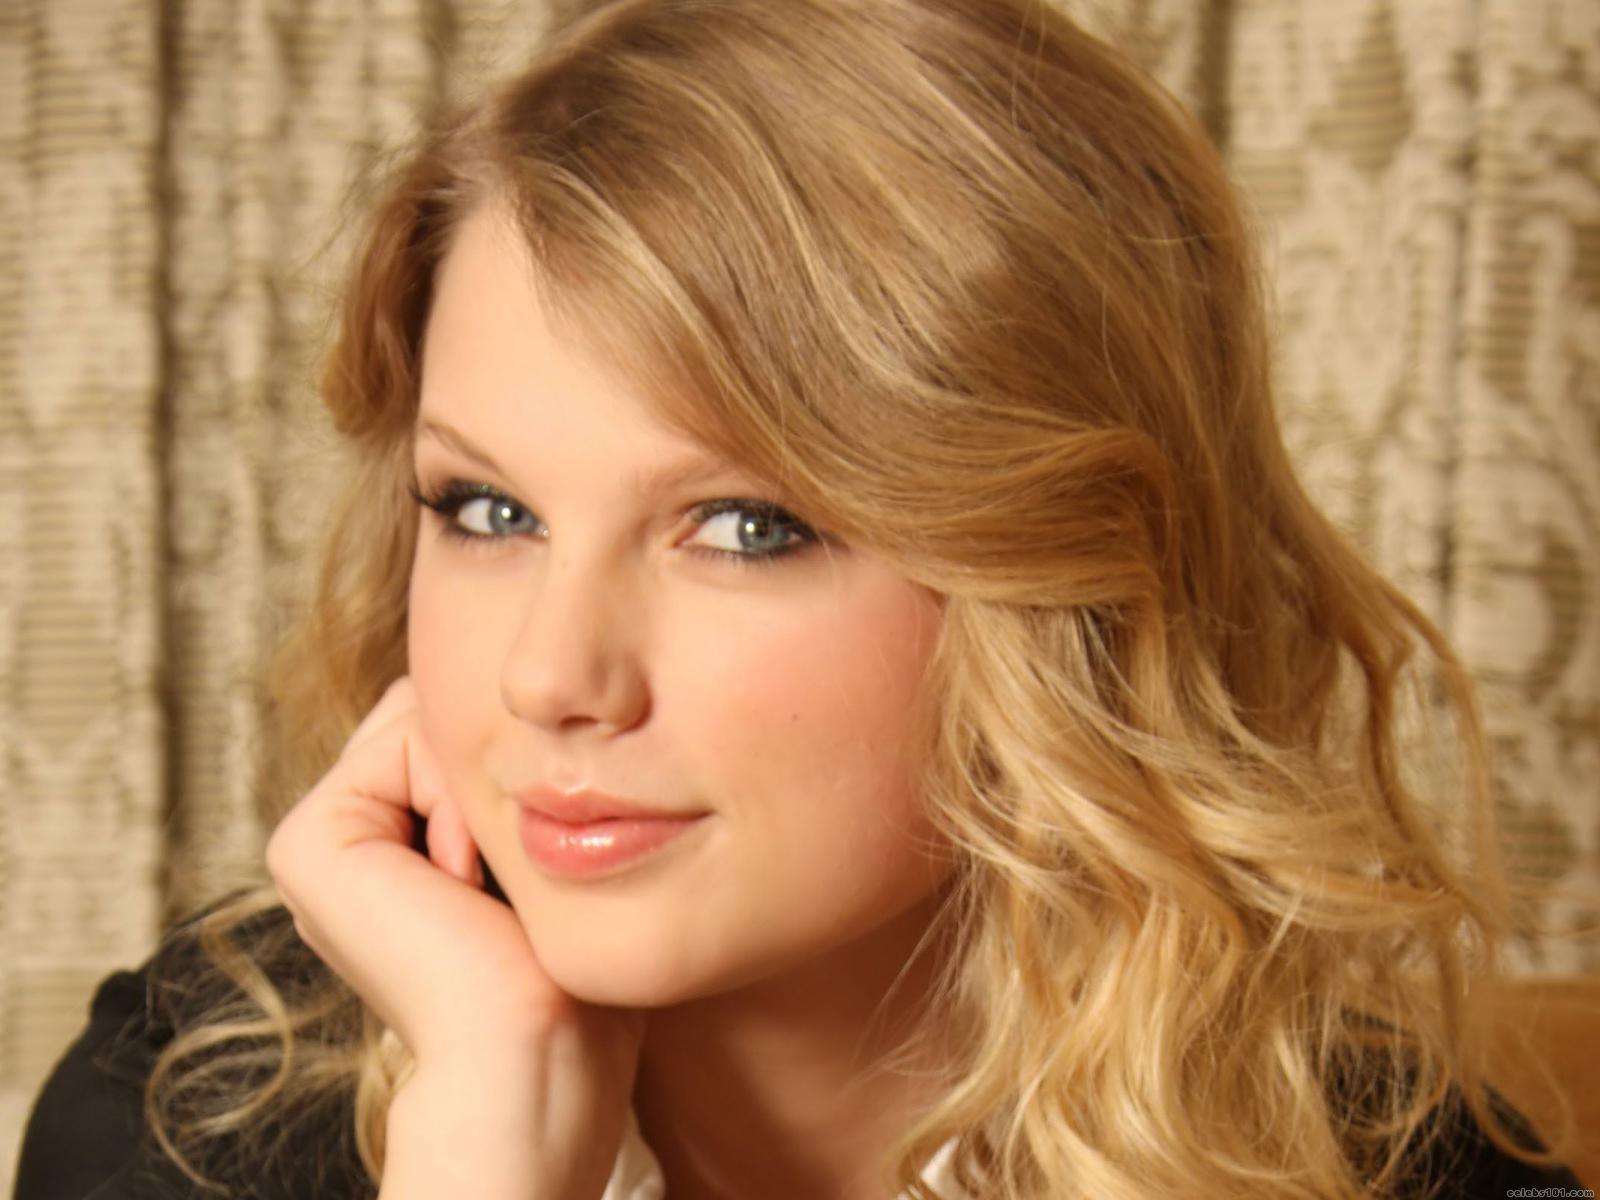 Taylor Swift Smoothies - Taylor Swift Smoothies